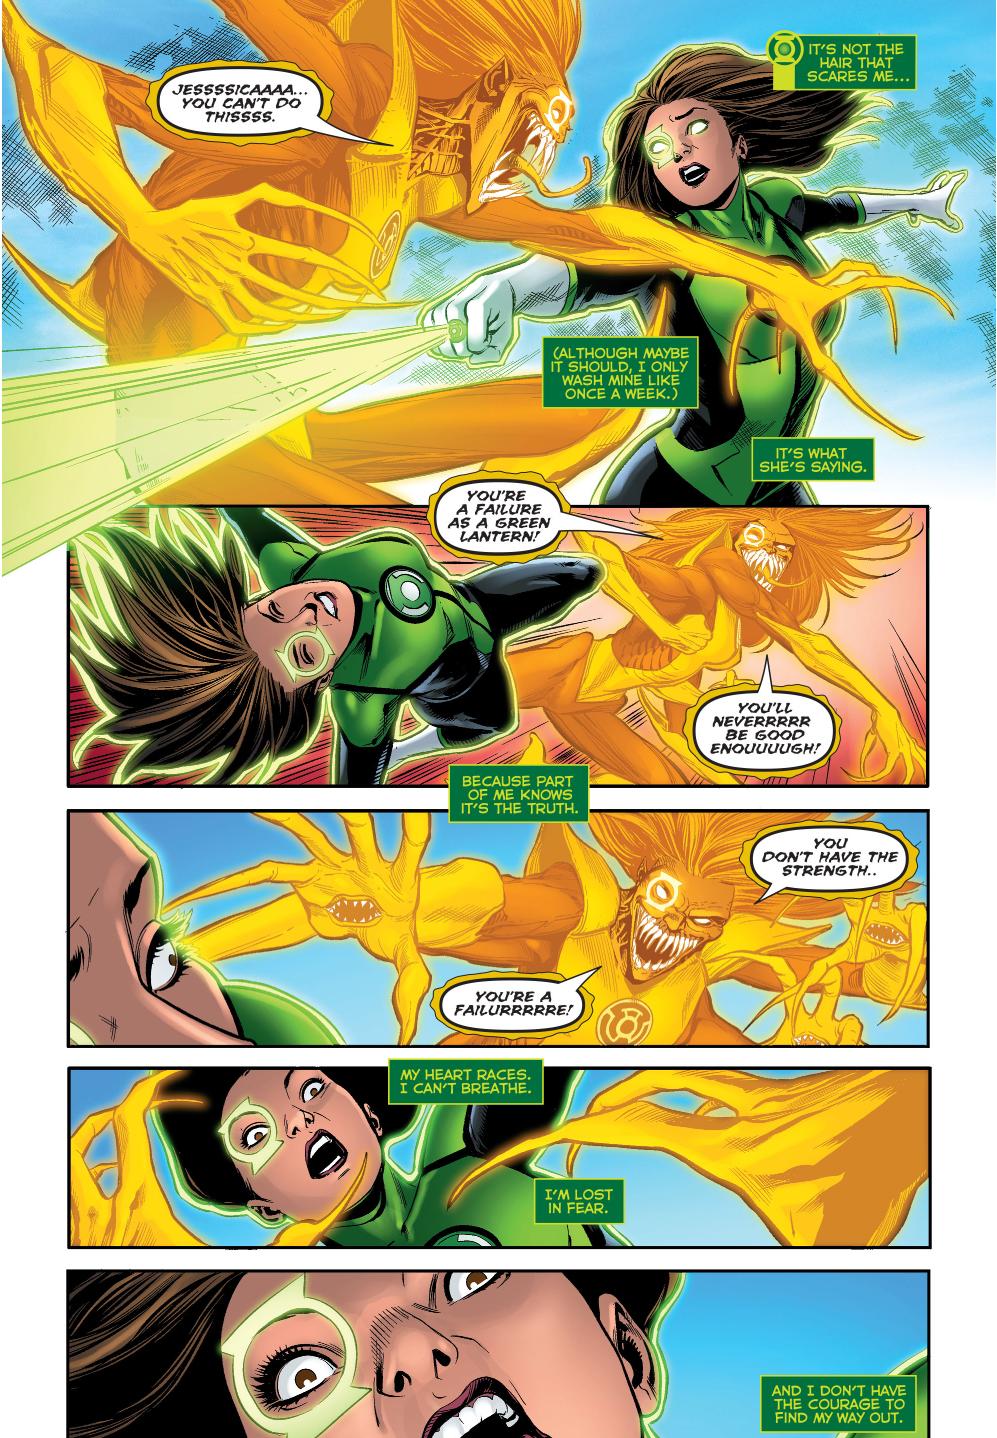 green-lanterns-vs-a-yellow-phantom-lantern